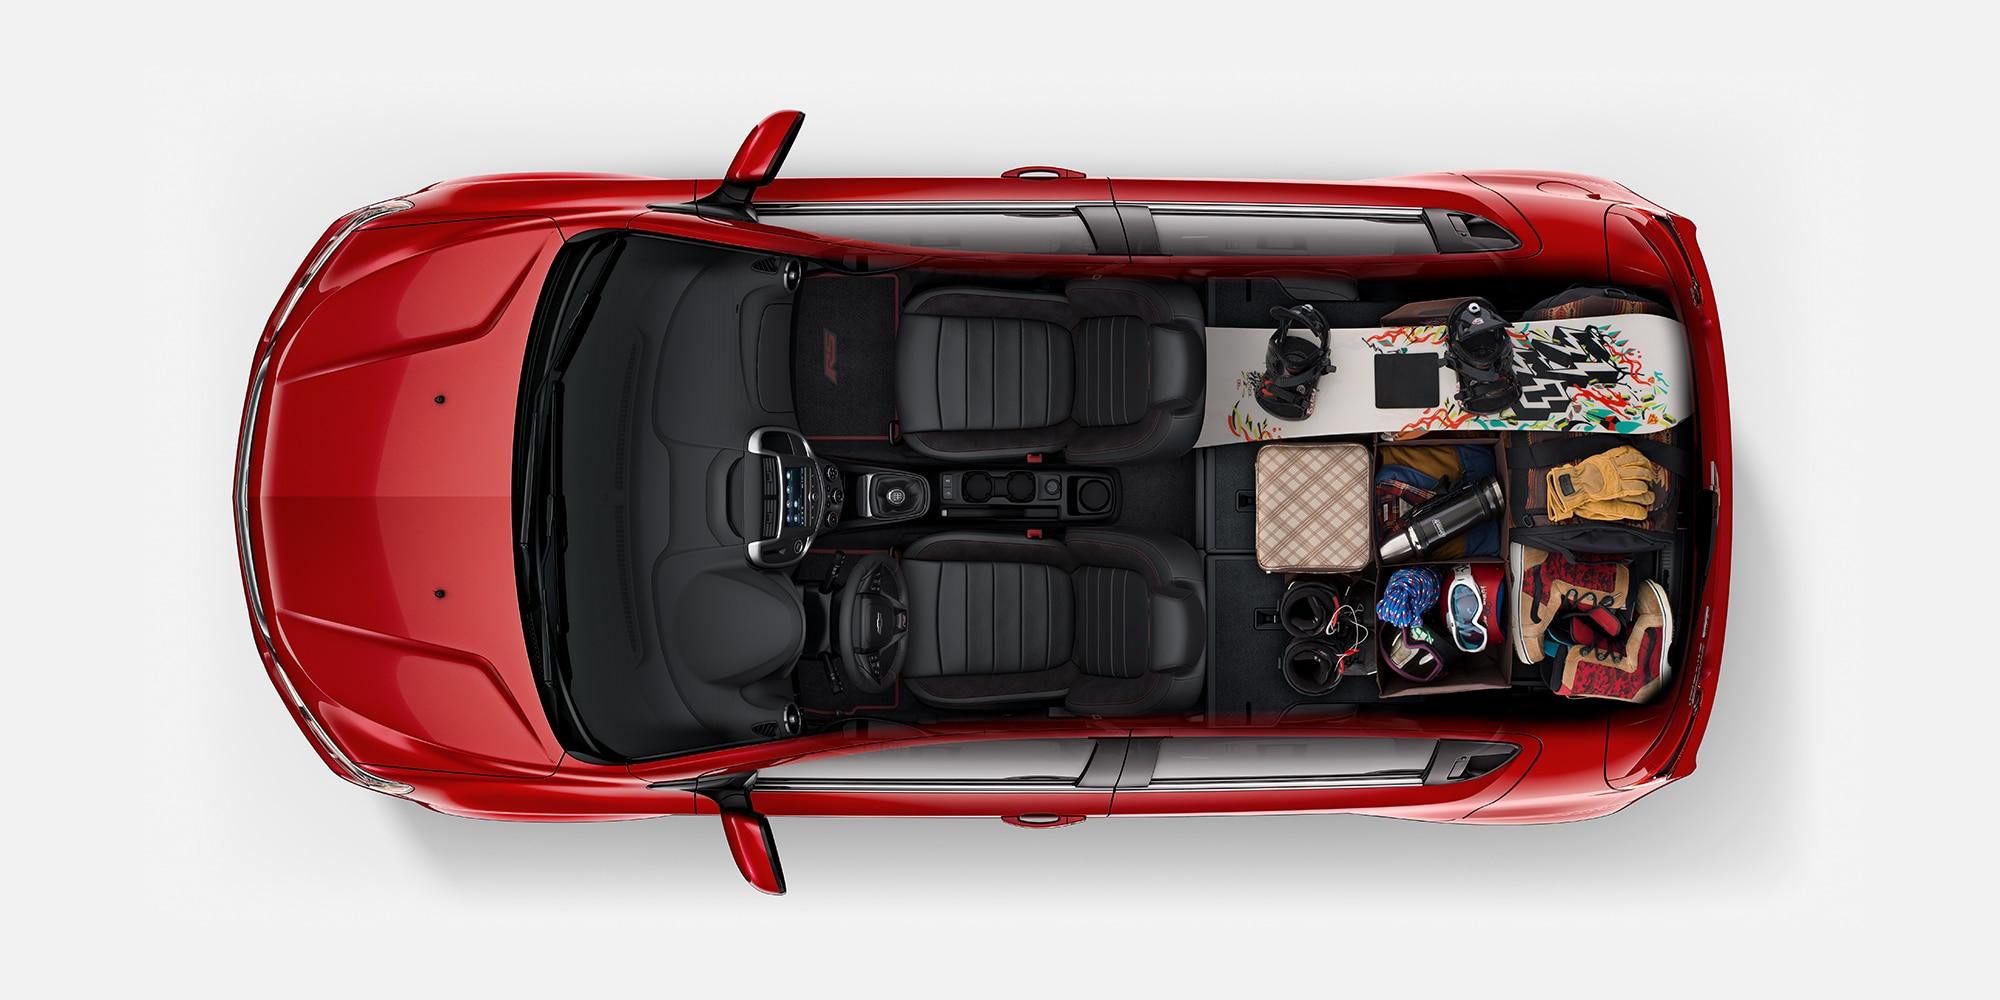 Diseño del auto compacto Chevrolet Sonic 2018: Fanático del aire libre